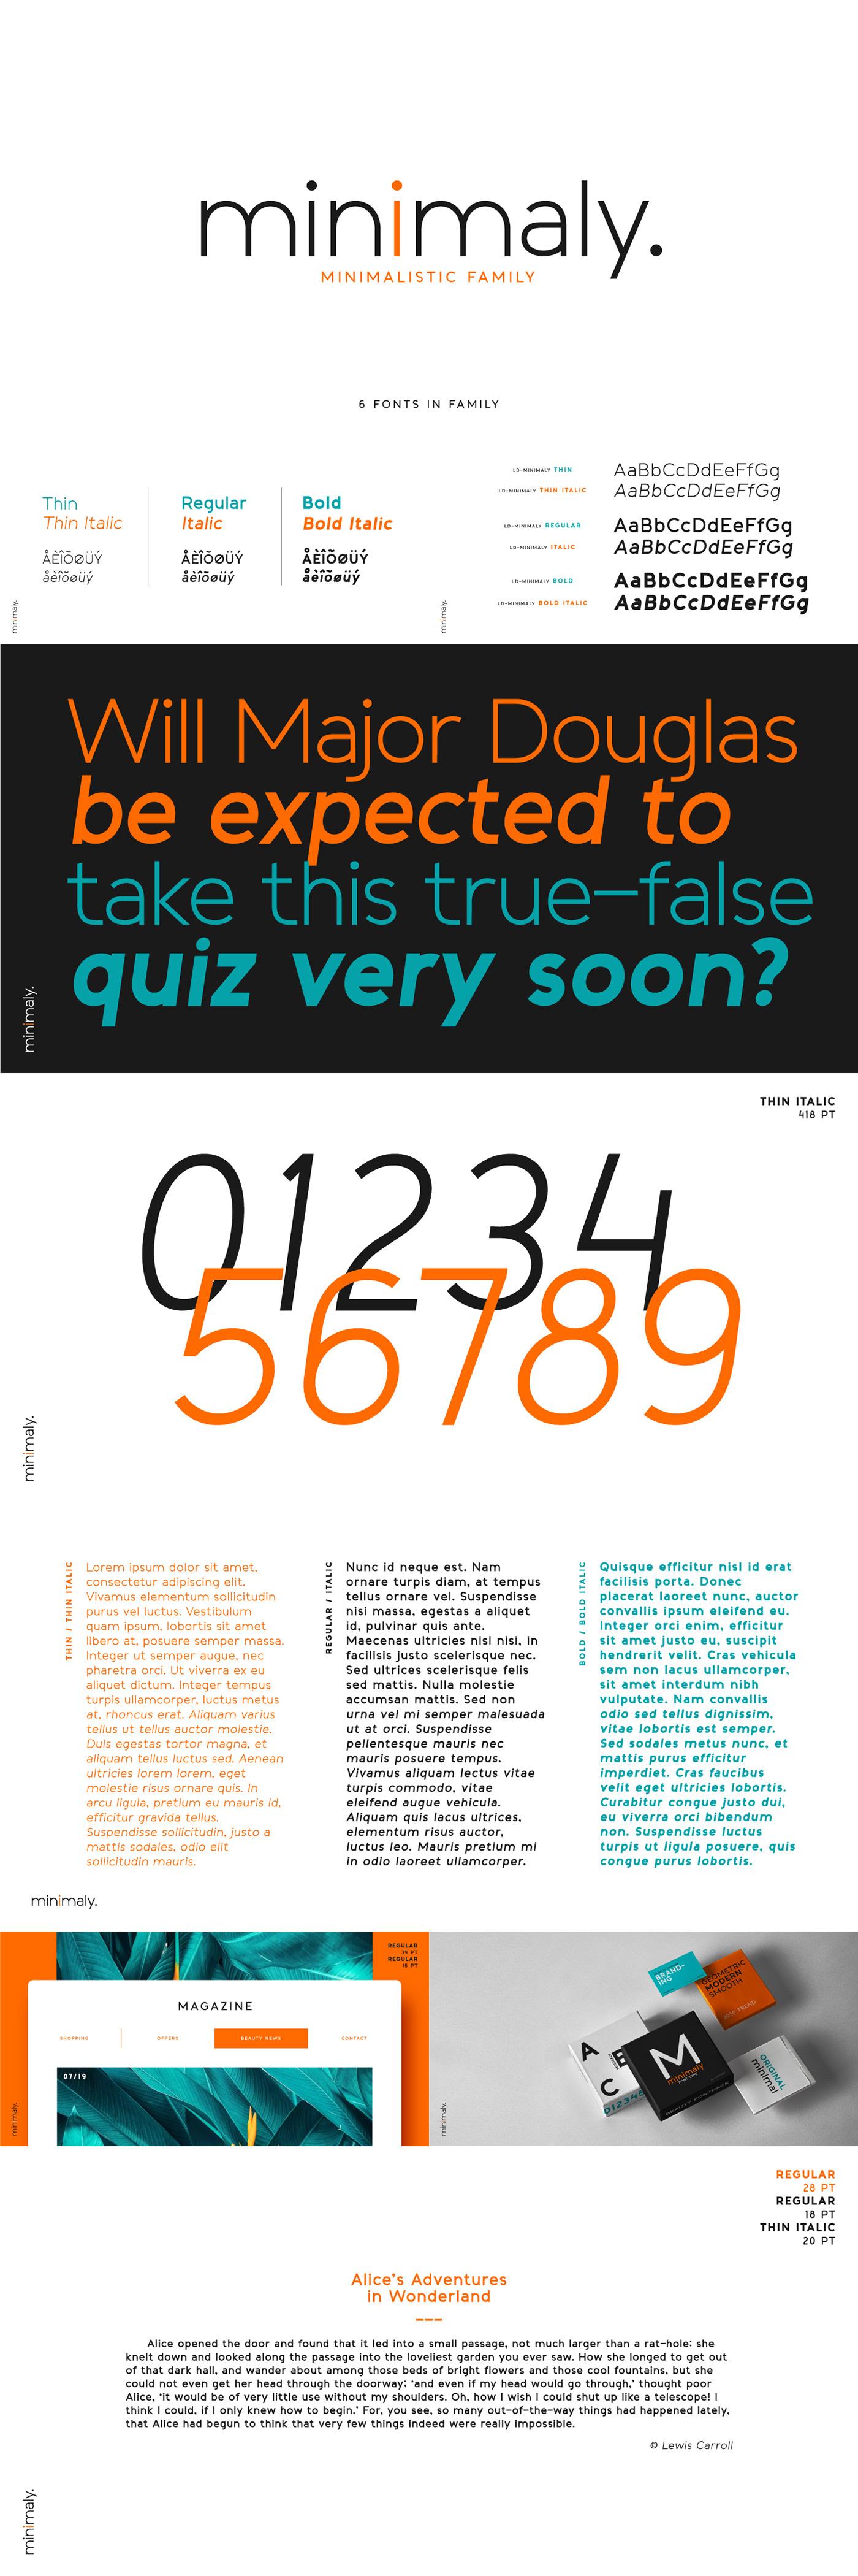 bundle buy font font family fonts minimal Minimalism otf sans serif Typeface